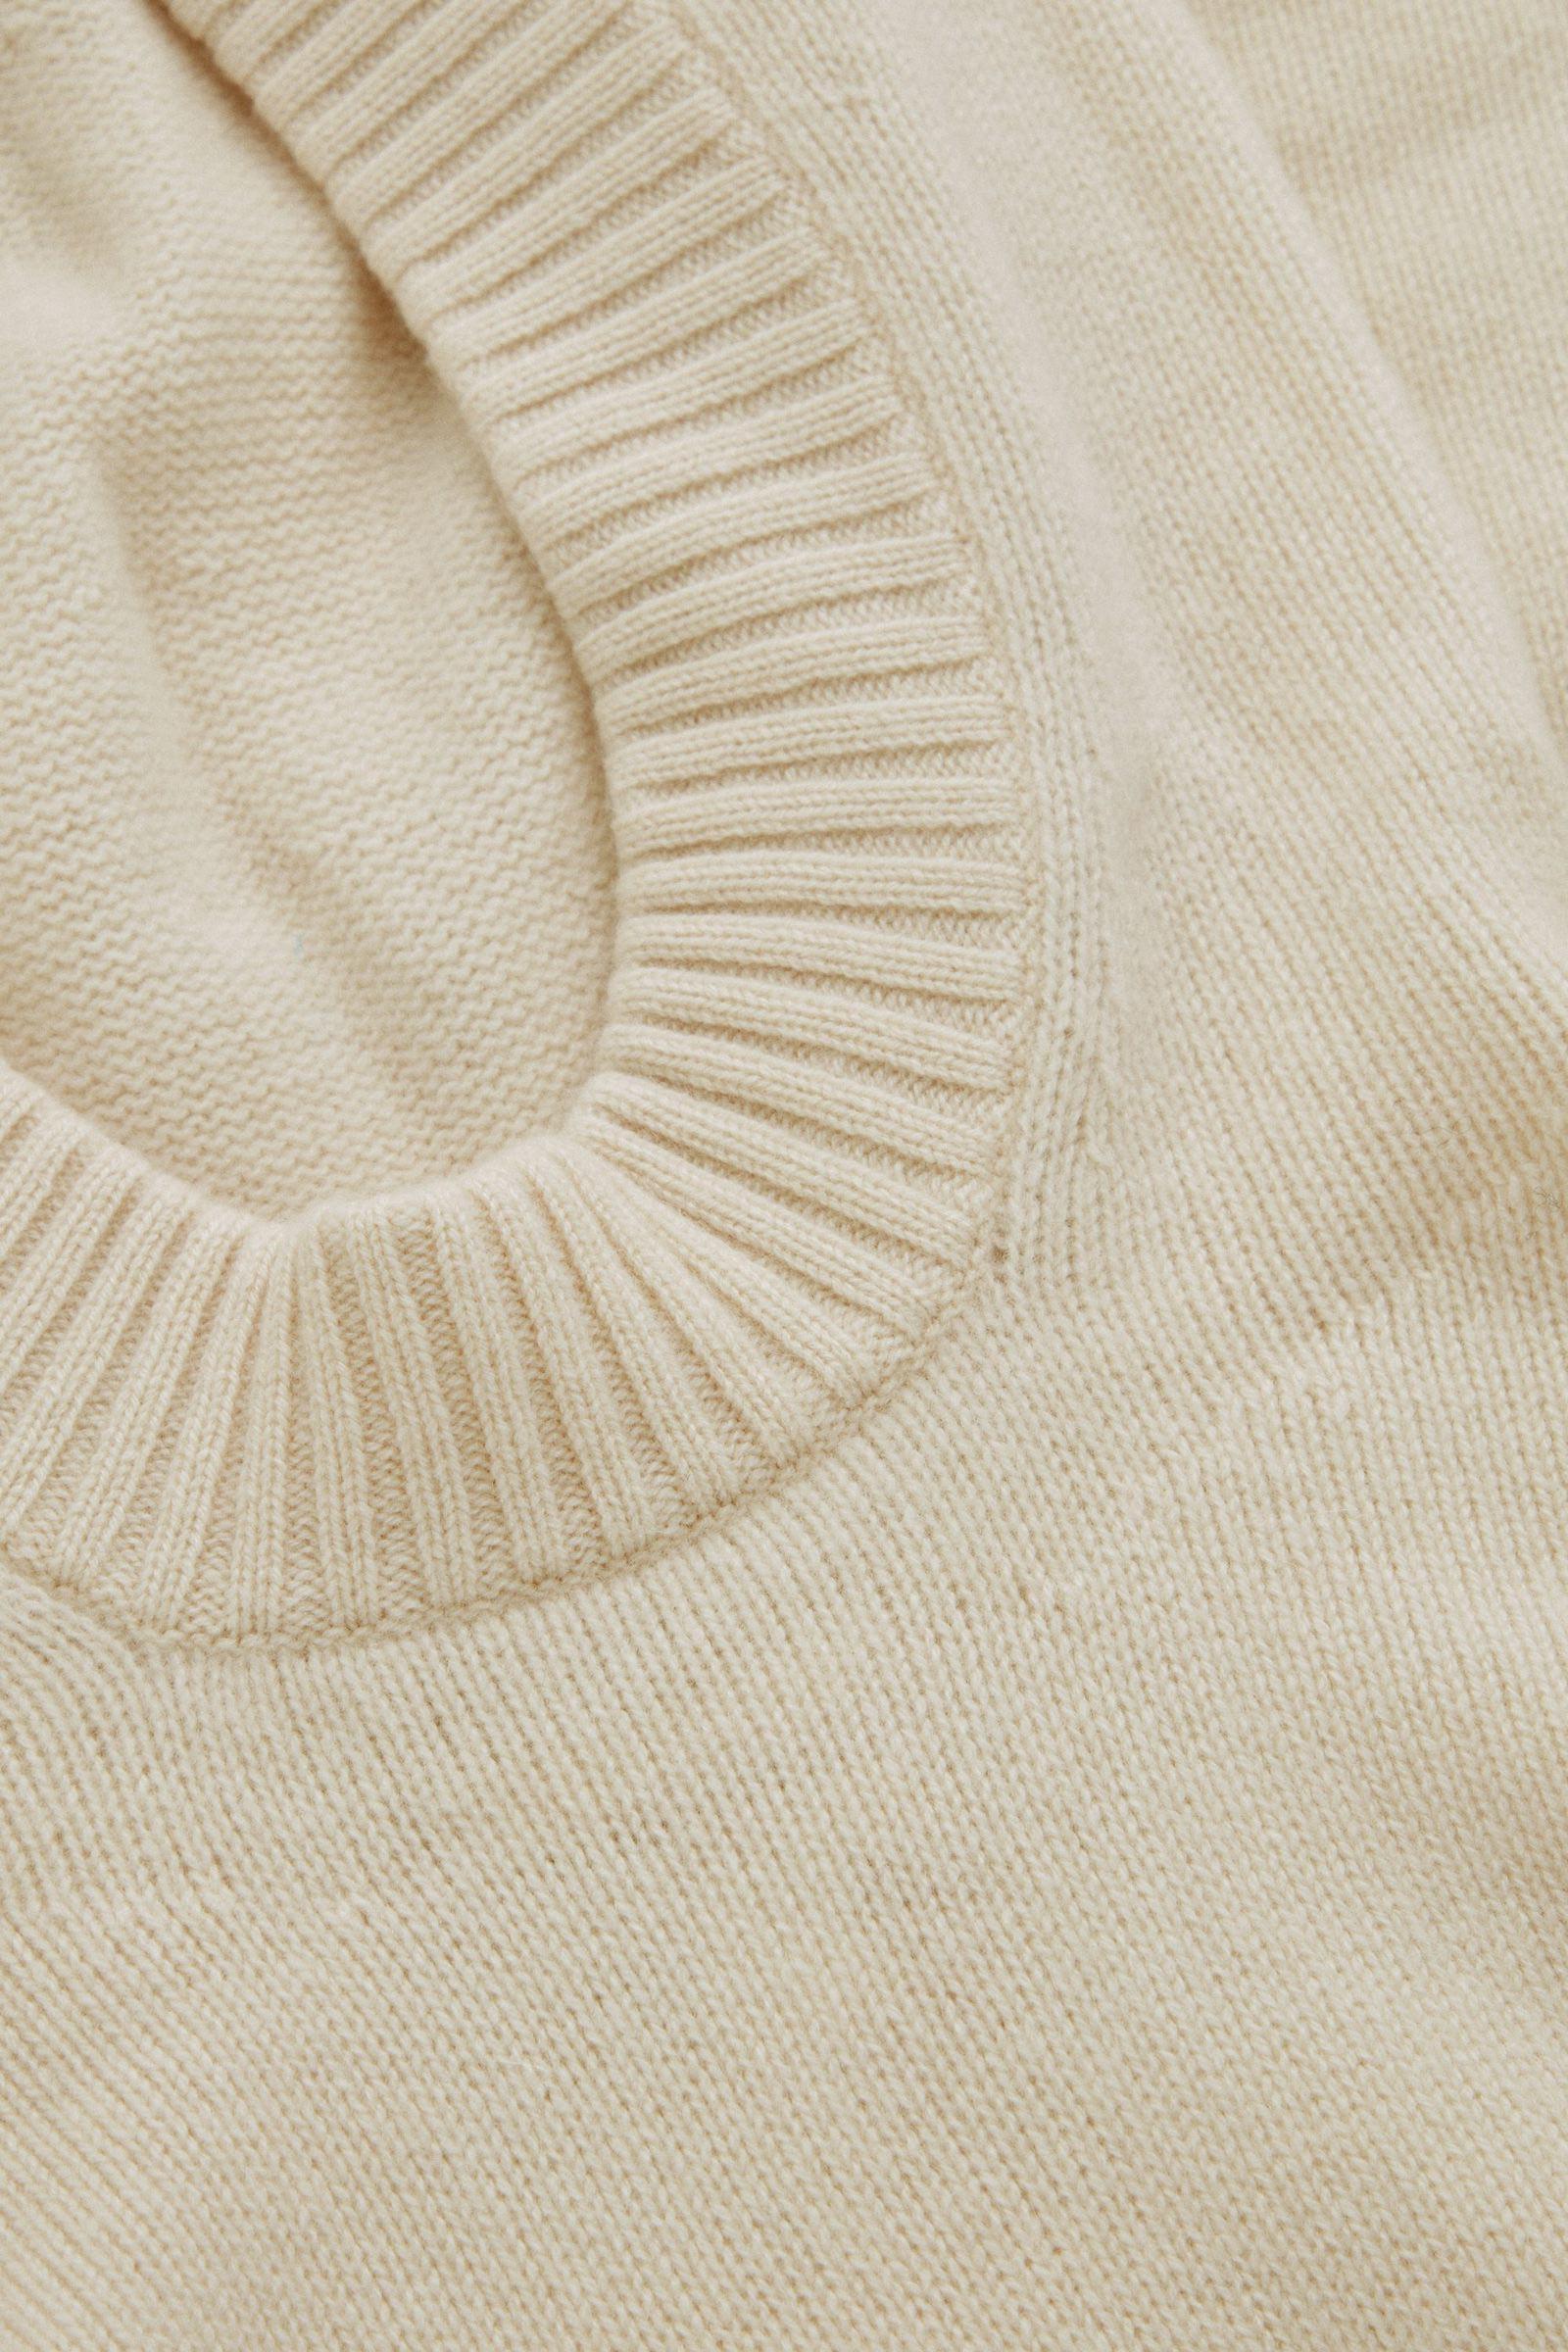 COS 니티드 캐시미어 후디의 화이트컬러 Detail입니다.